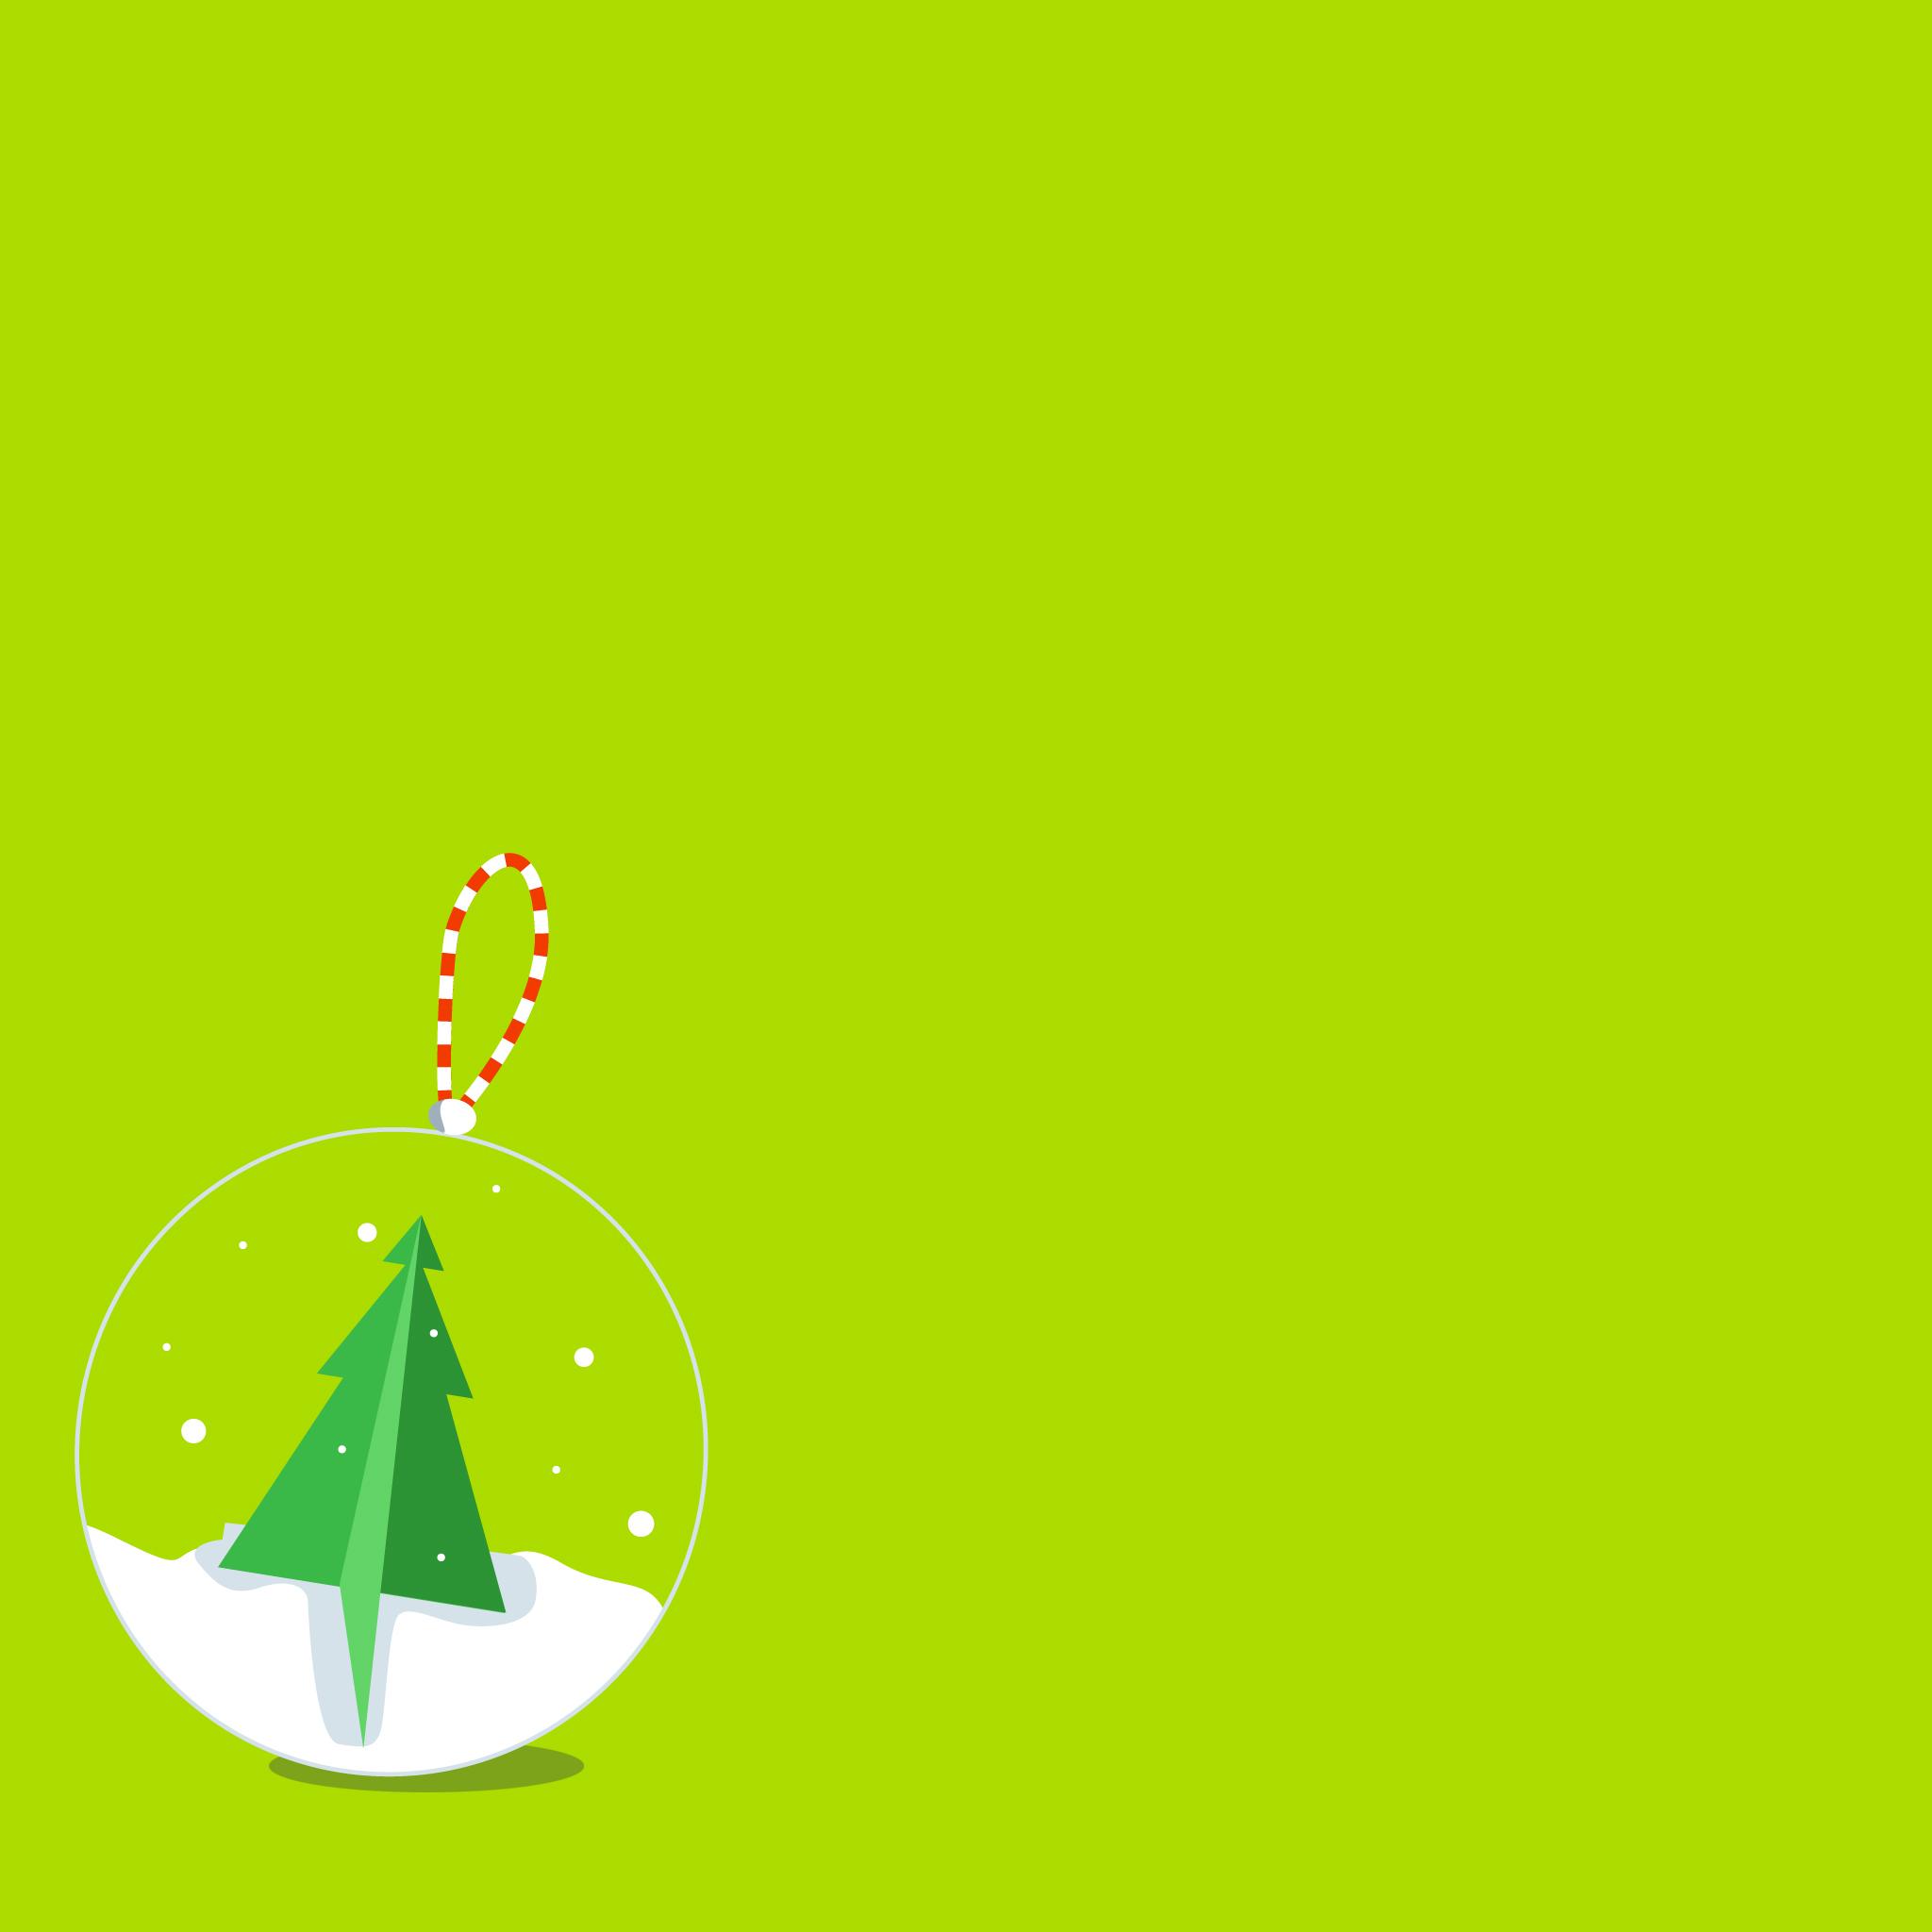 Christmas Ornament 3Wallpapers iPad Retina Christmas Ornament   iPad Retina